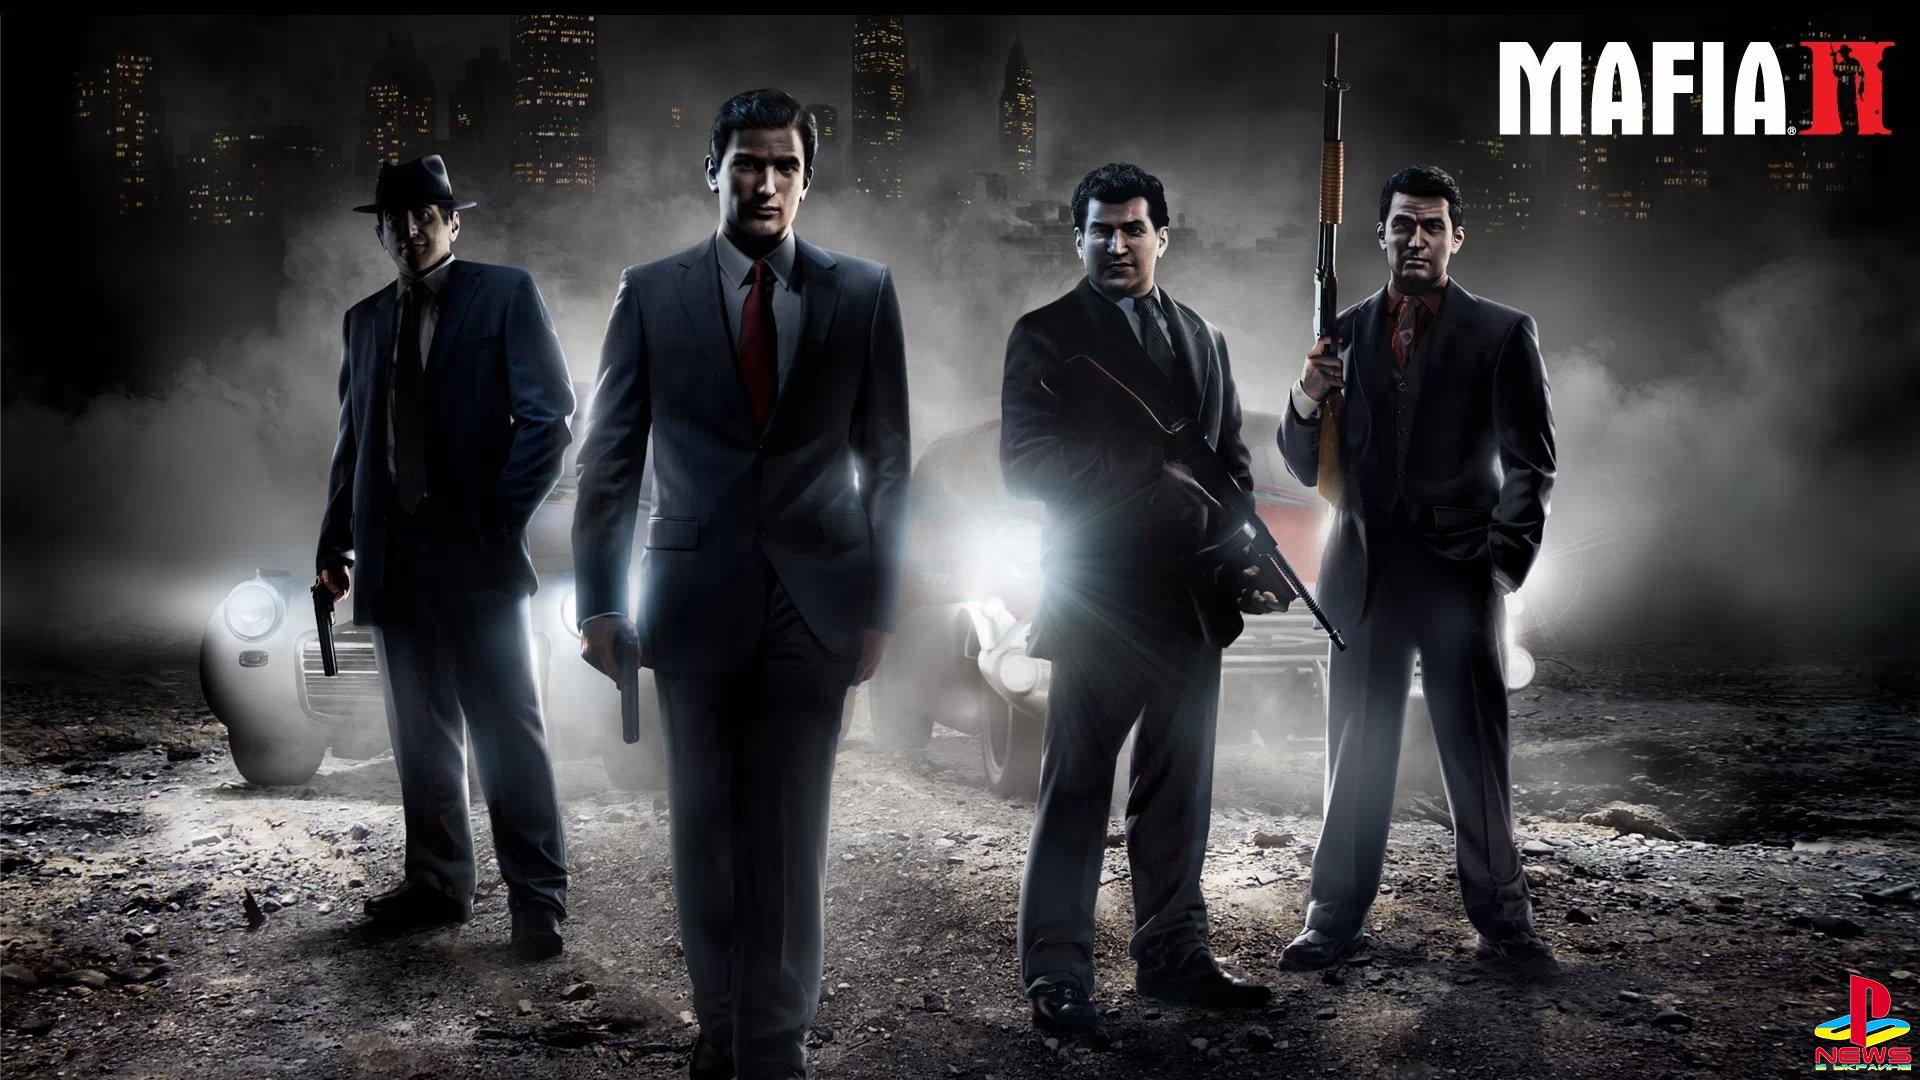 Take-Two обновила торговую марку Mafia — продолжение следует?